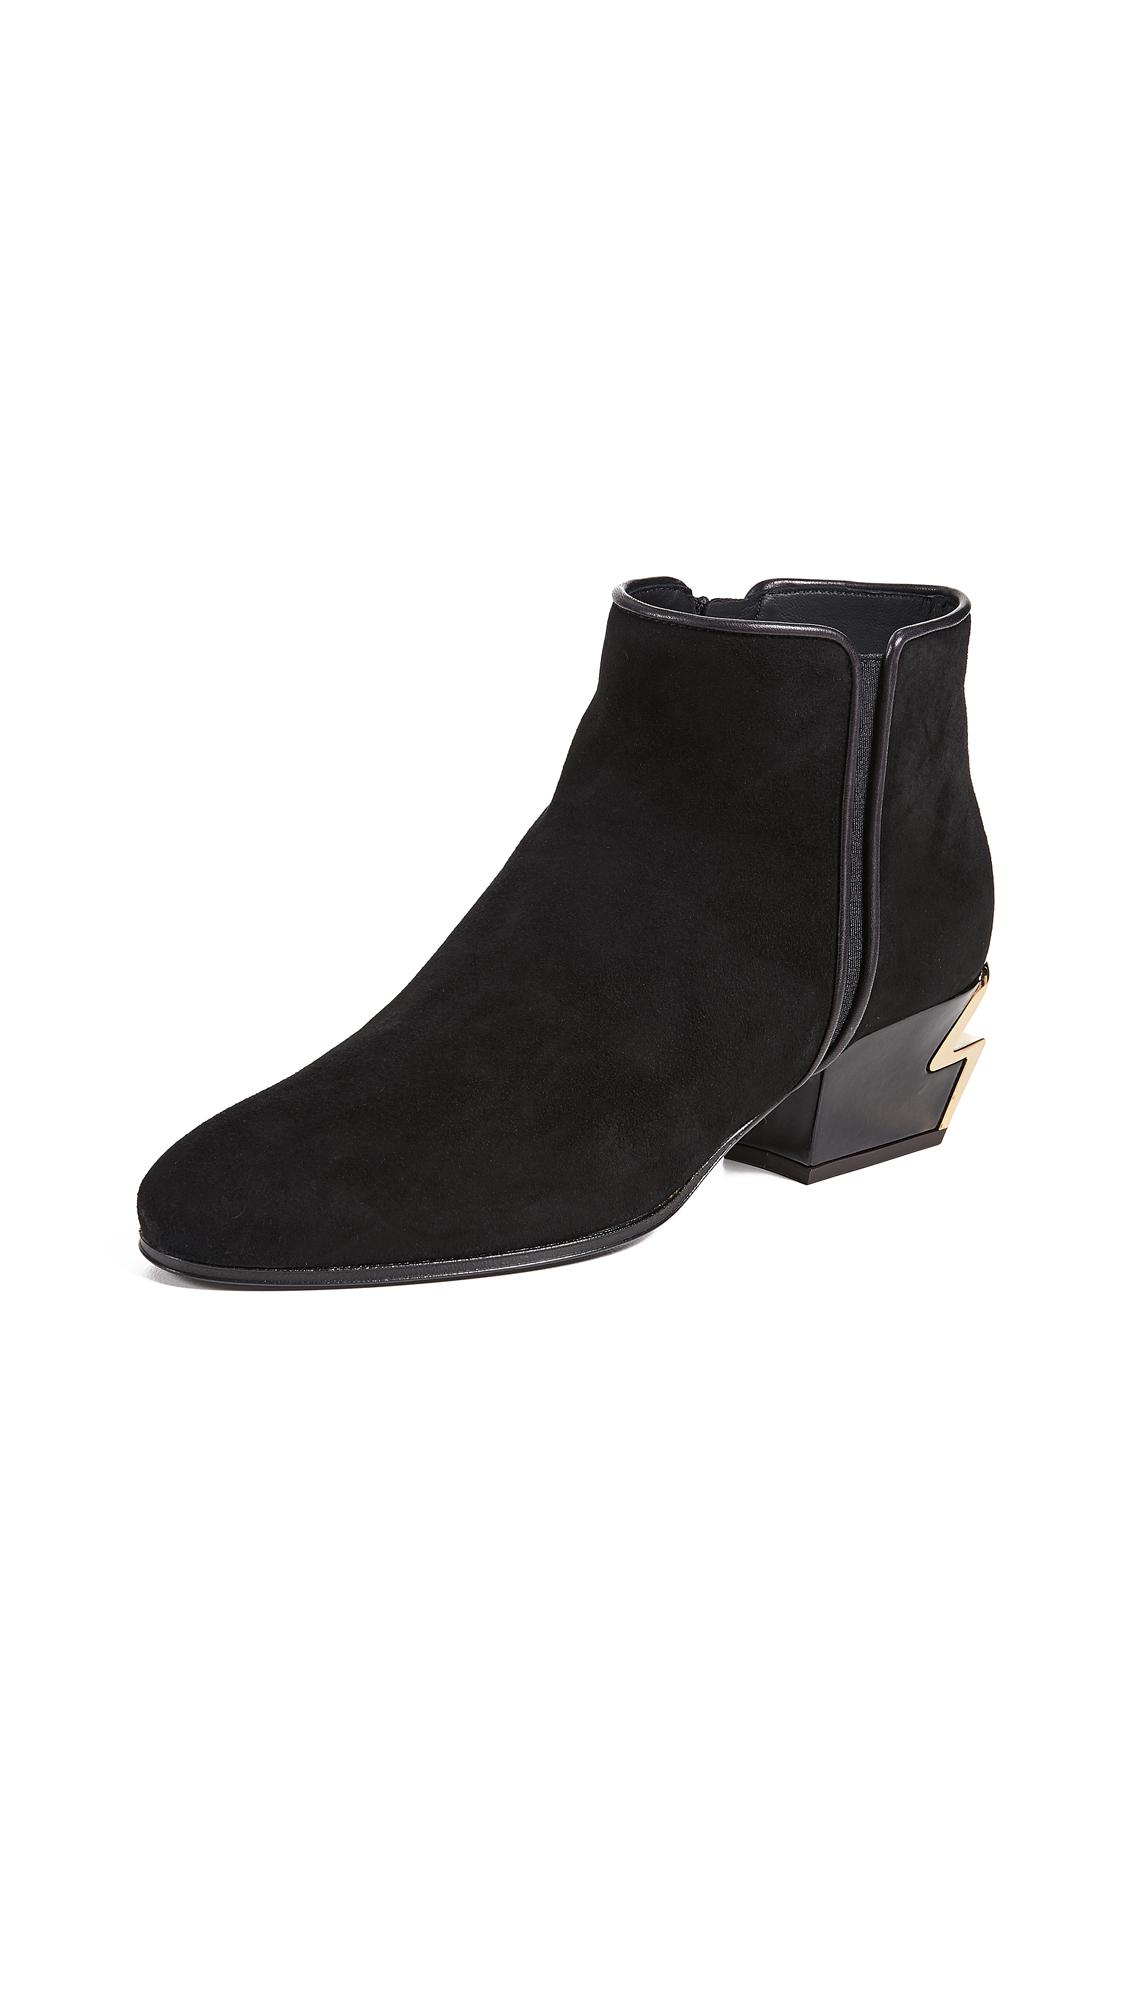 Giuseppe Zanotti Ankle Booties - Nero